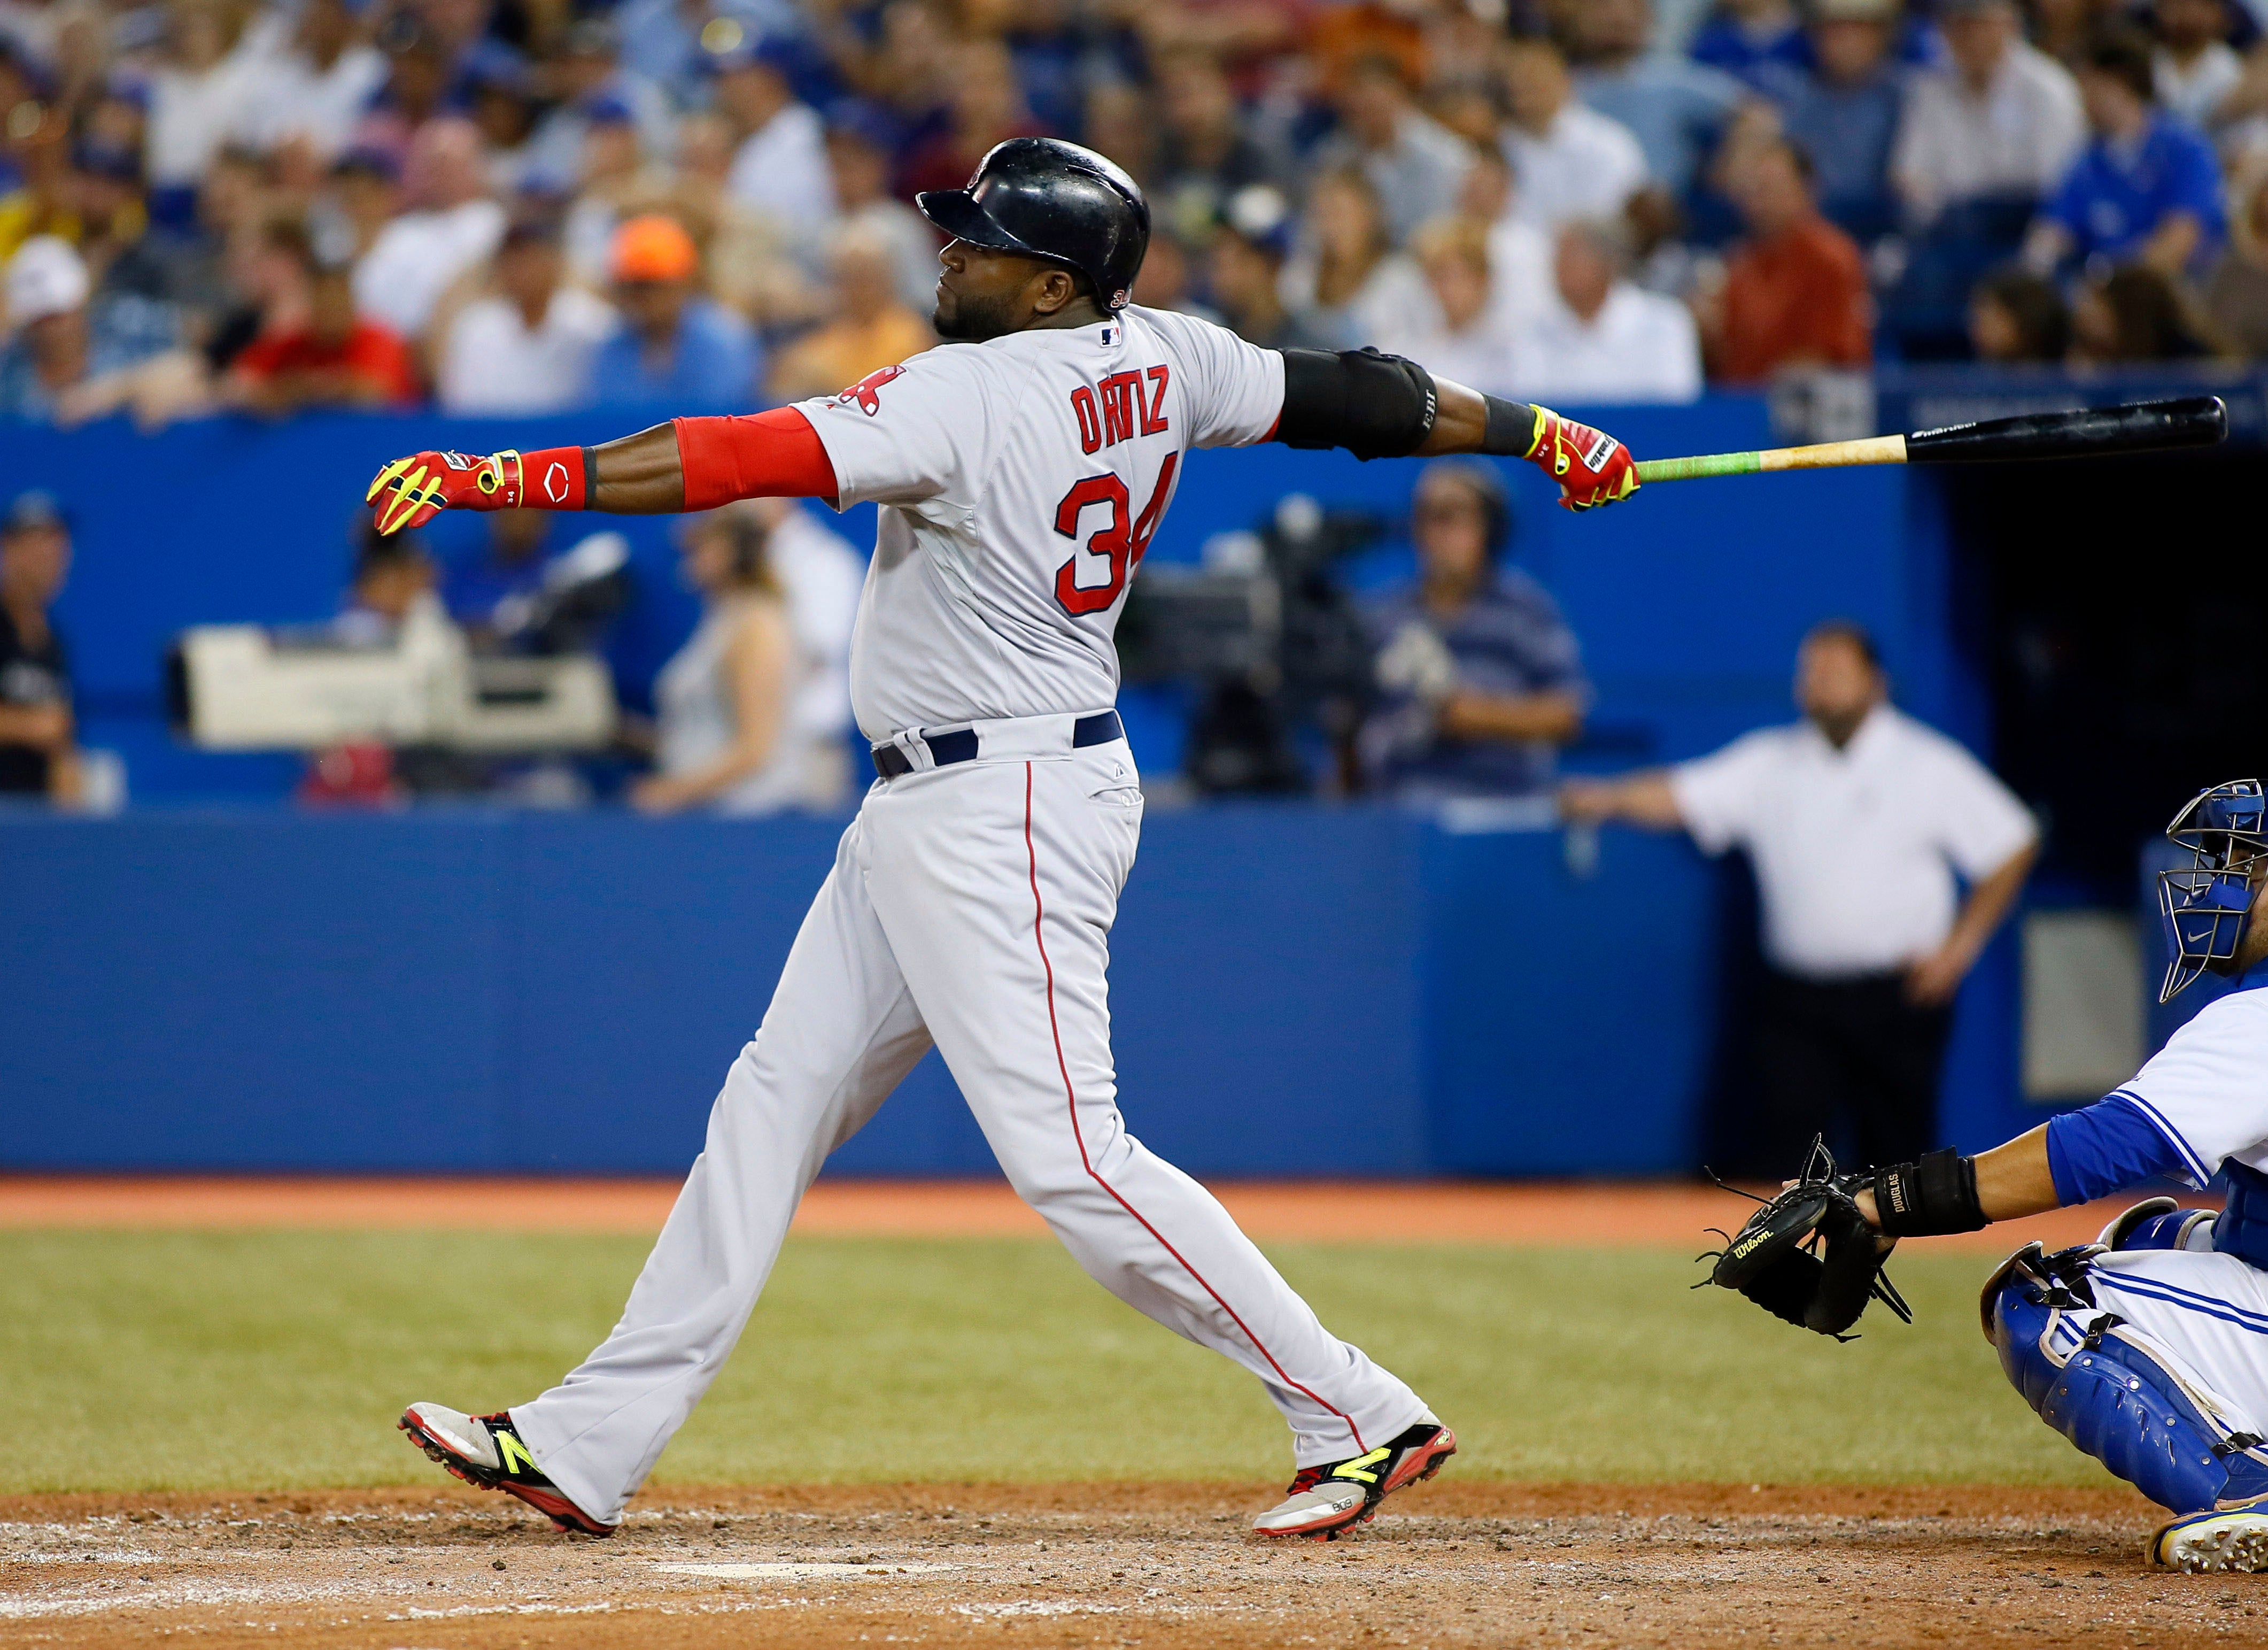 2014-07-23T023906Z_1998993828_NOCID_RTRMADP_3_MLB-BOSTON-RED-SOX-AT-TORONTO-BLUE-JAYS.jpg